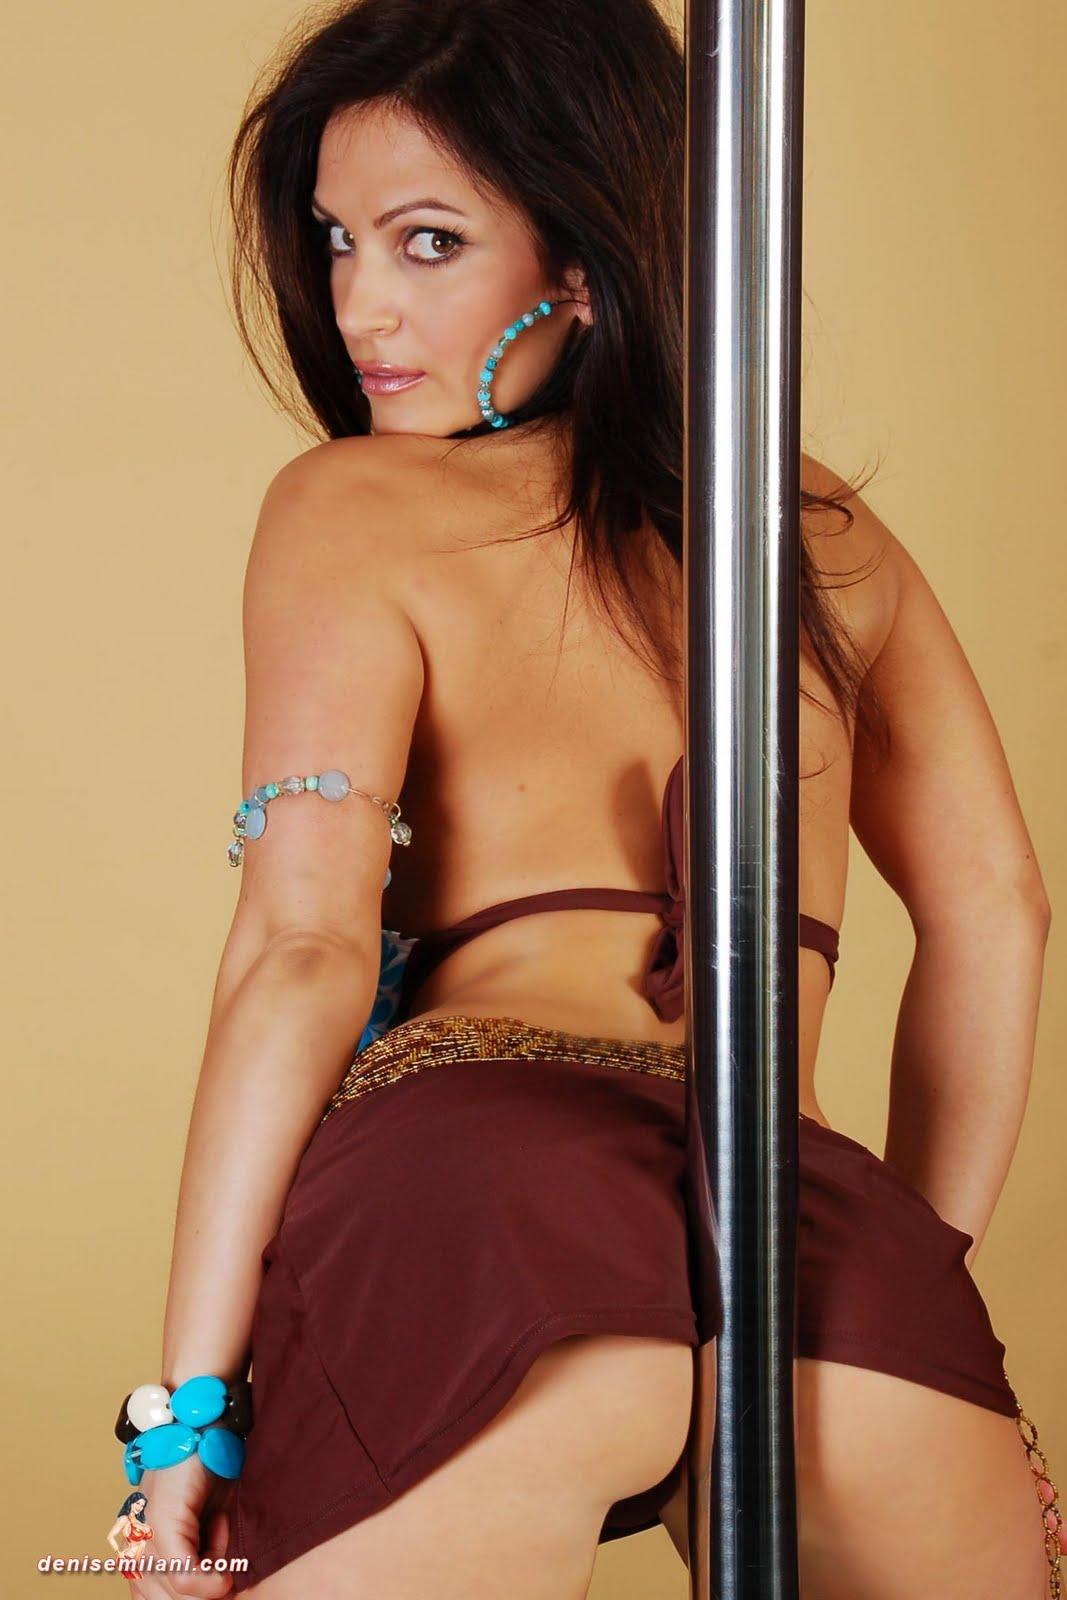 Best Style Fashion Big Girl Denise Milani Sexy Bikini -4100